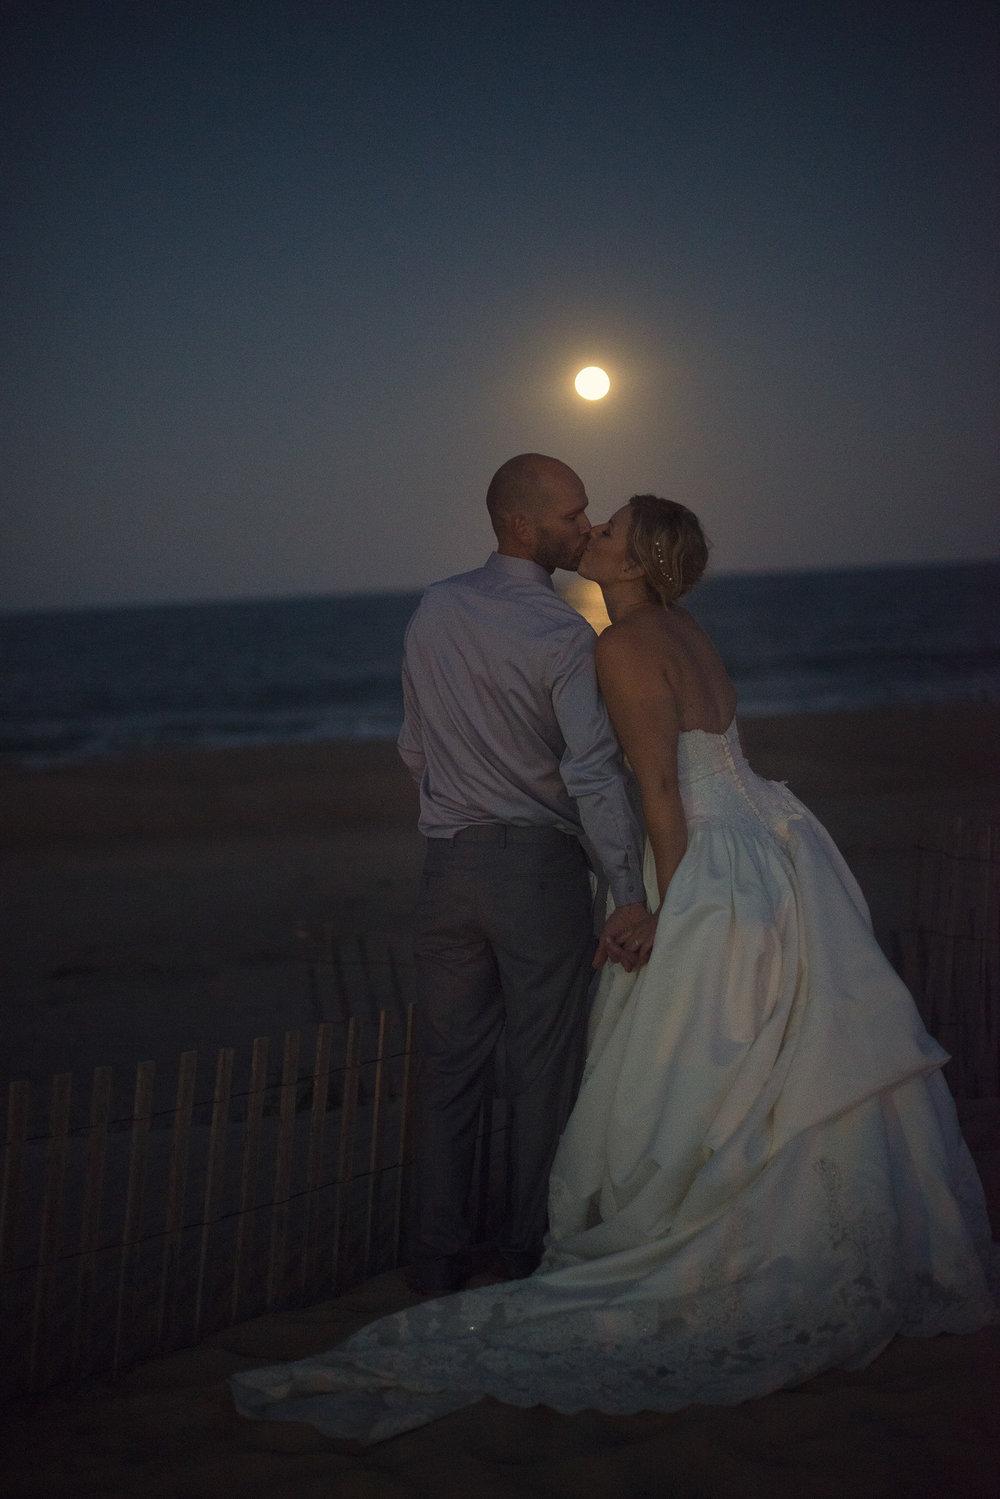 Wedding couple kiss night moonlight sand shore beach delaware THPHOTO